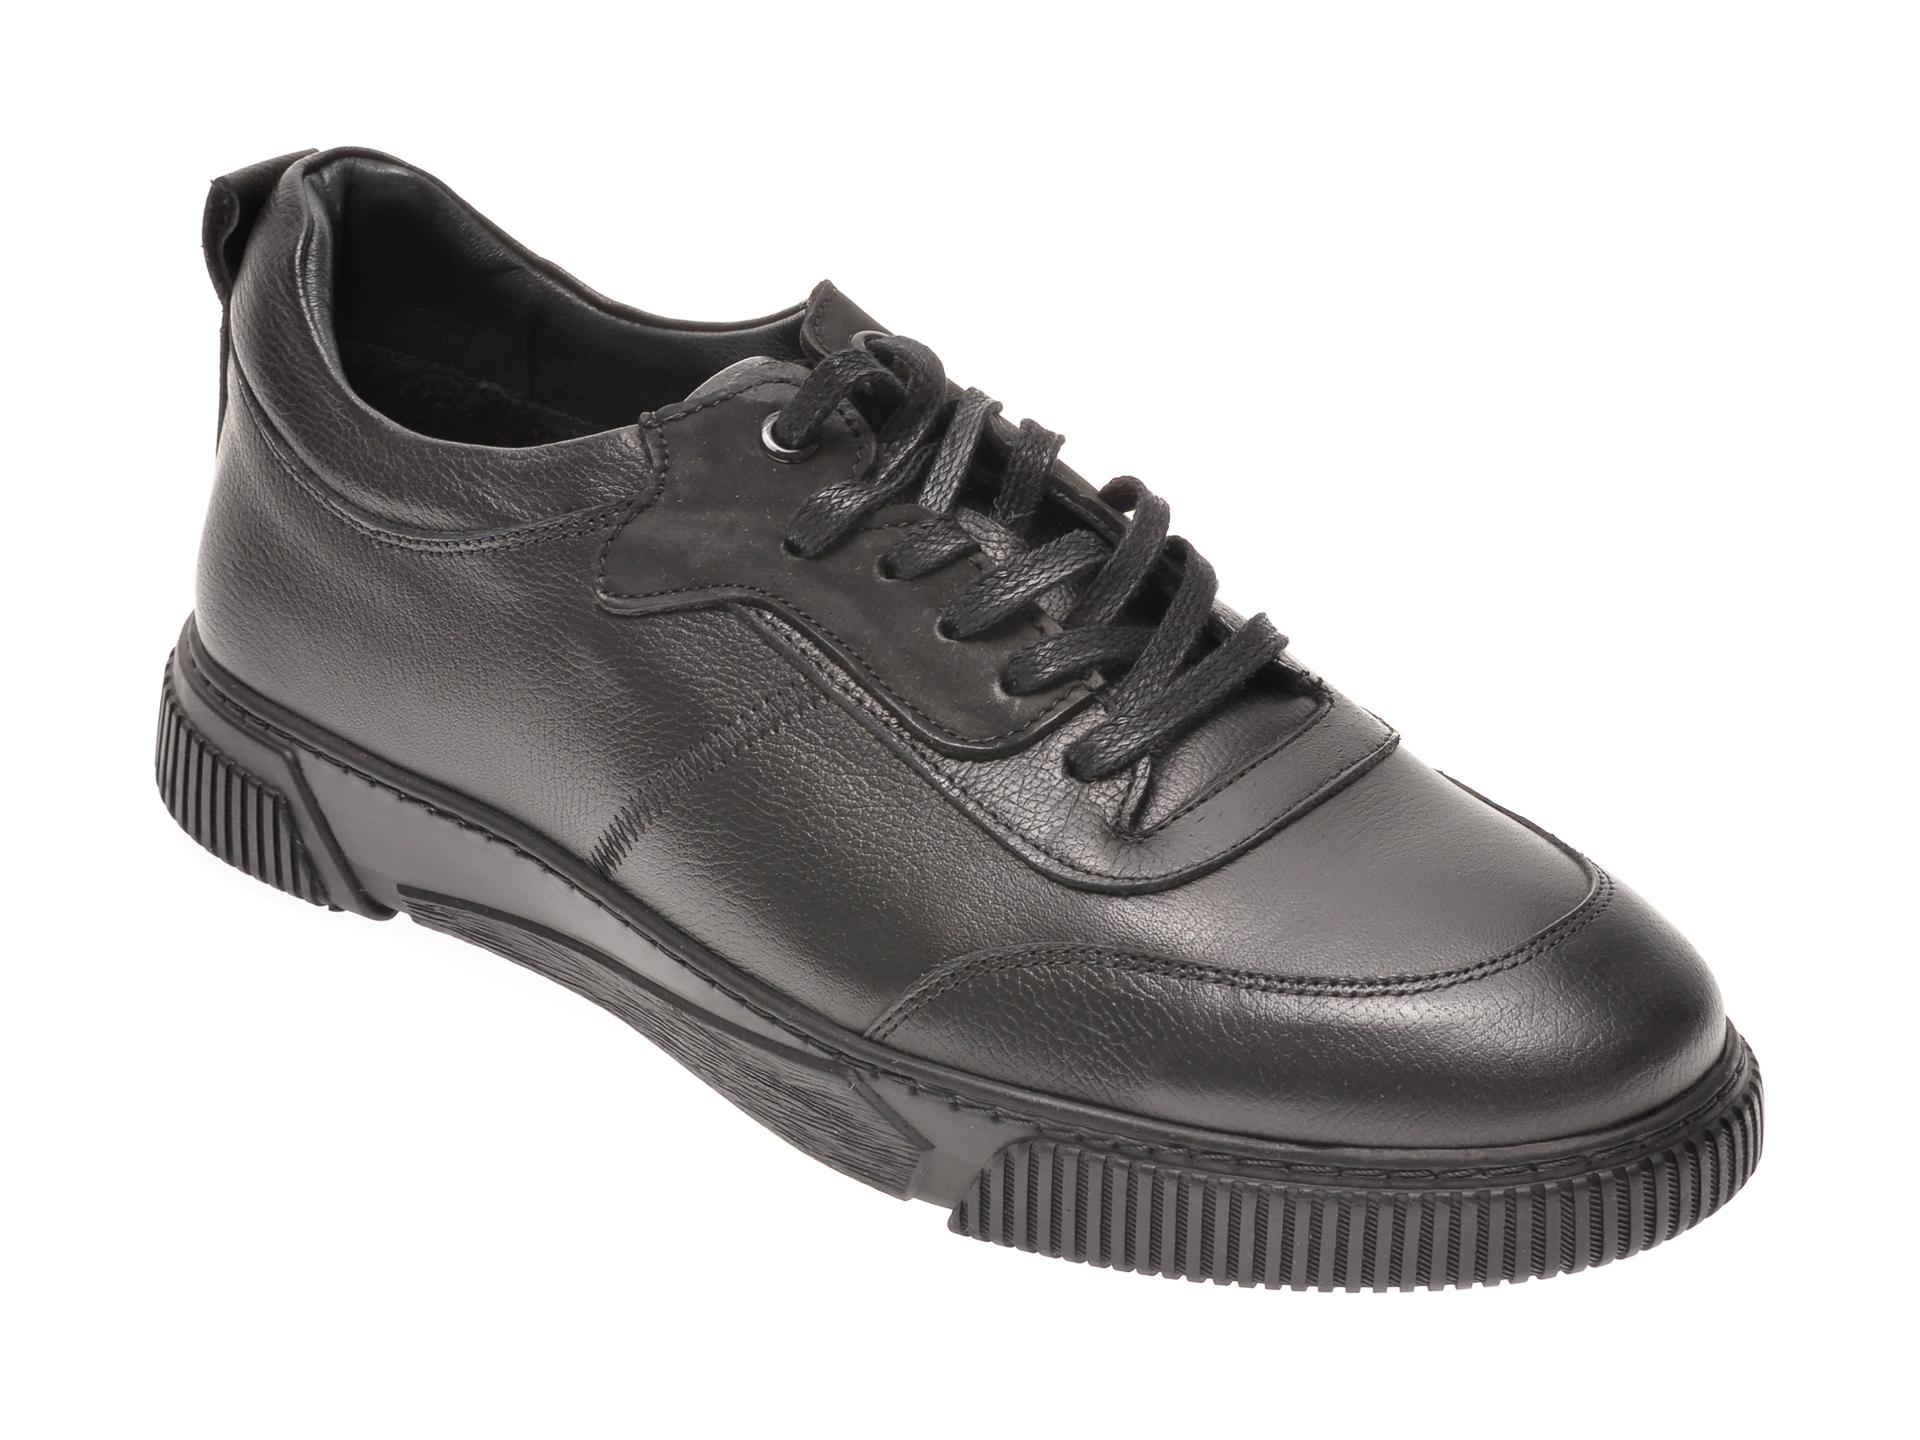 Pantofi Otter Negri, 78901, Din Piele Naturala